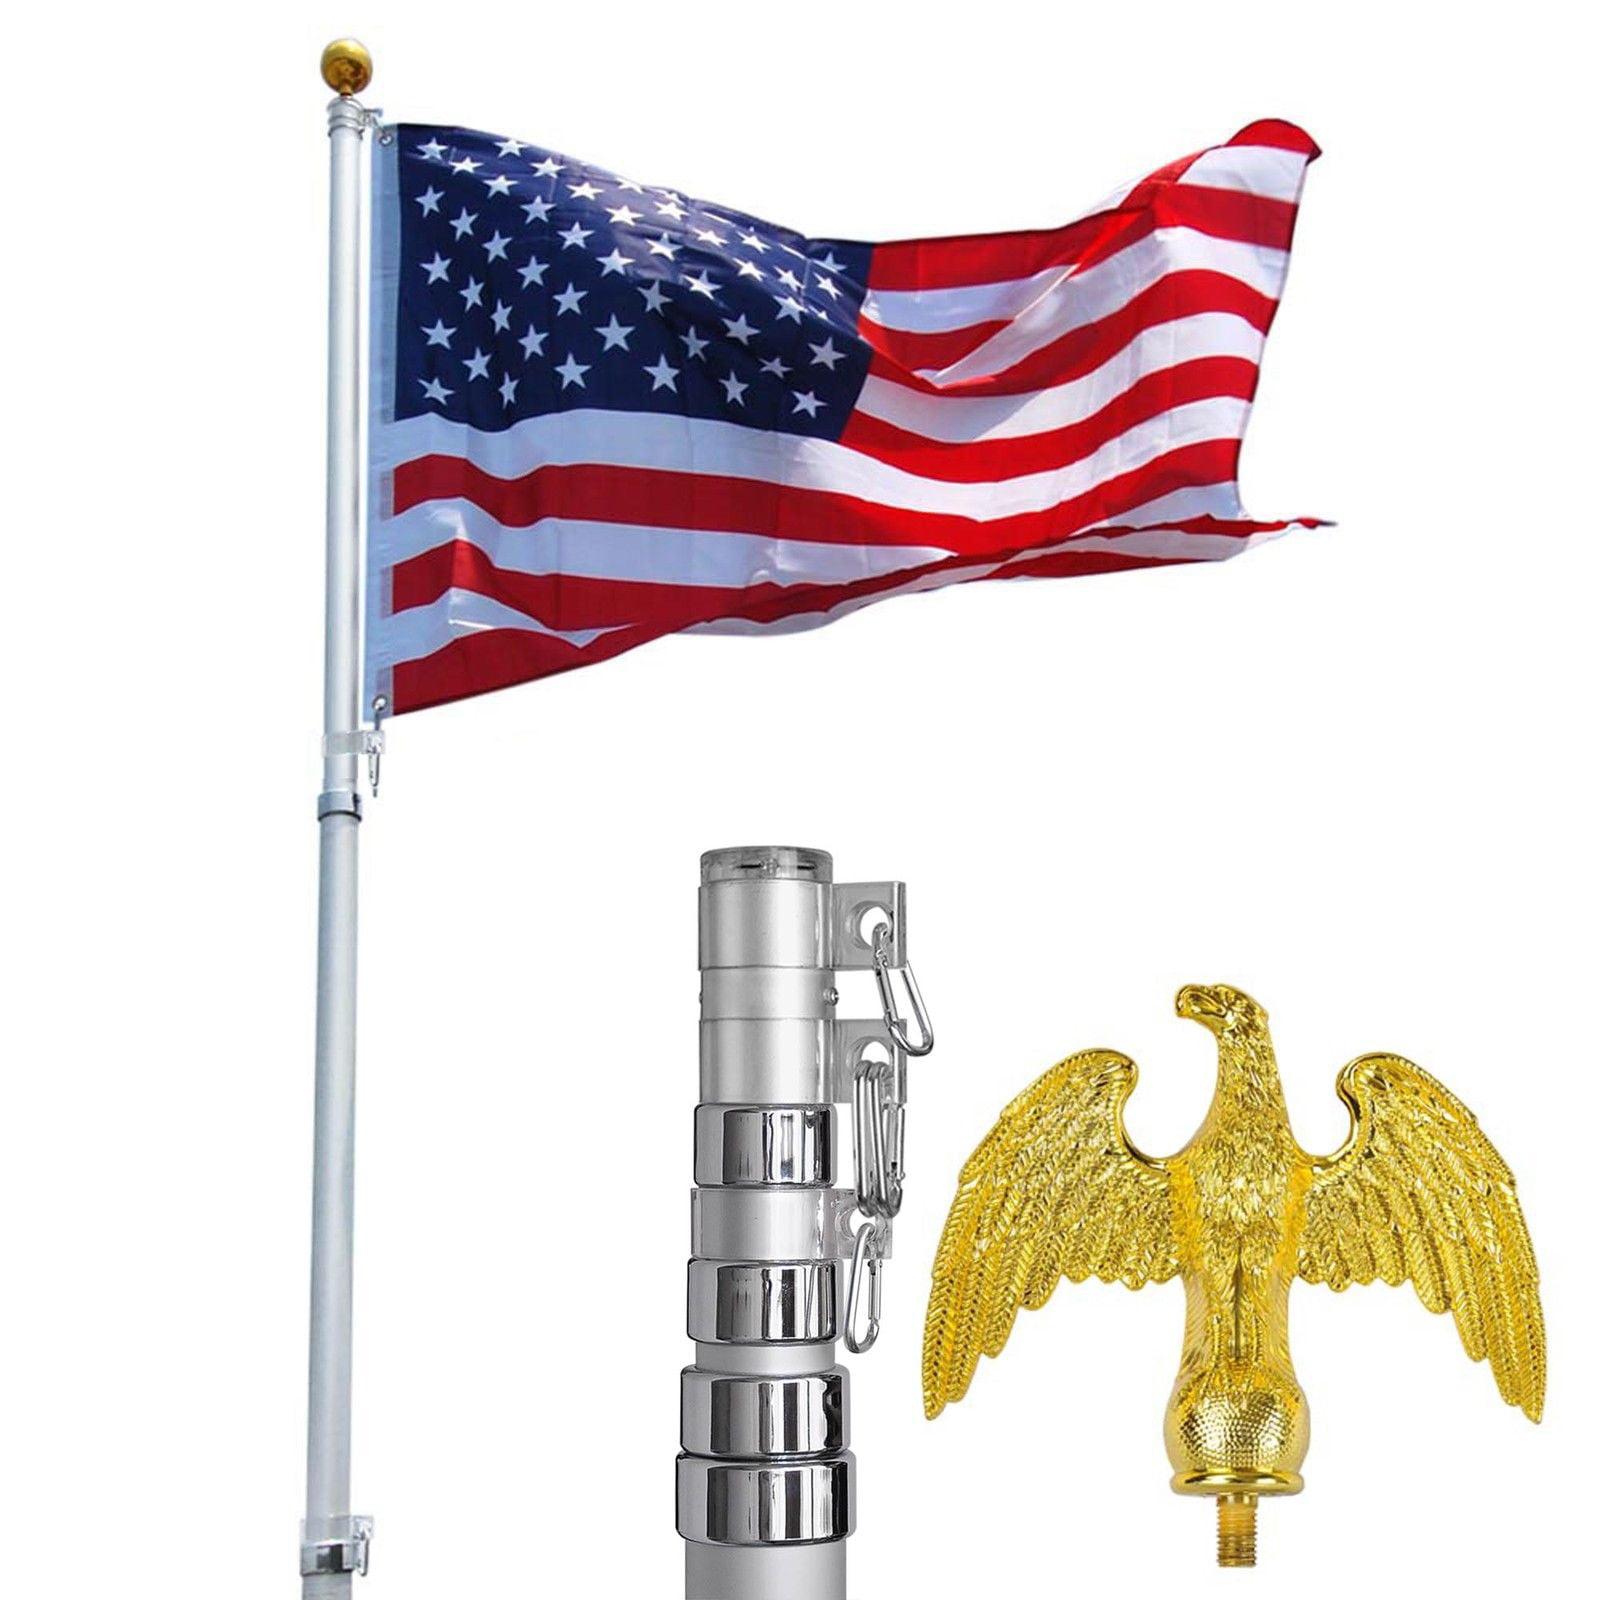 GHP 25' Aluminum Telescoping Flagpole with 3'x5' American...